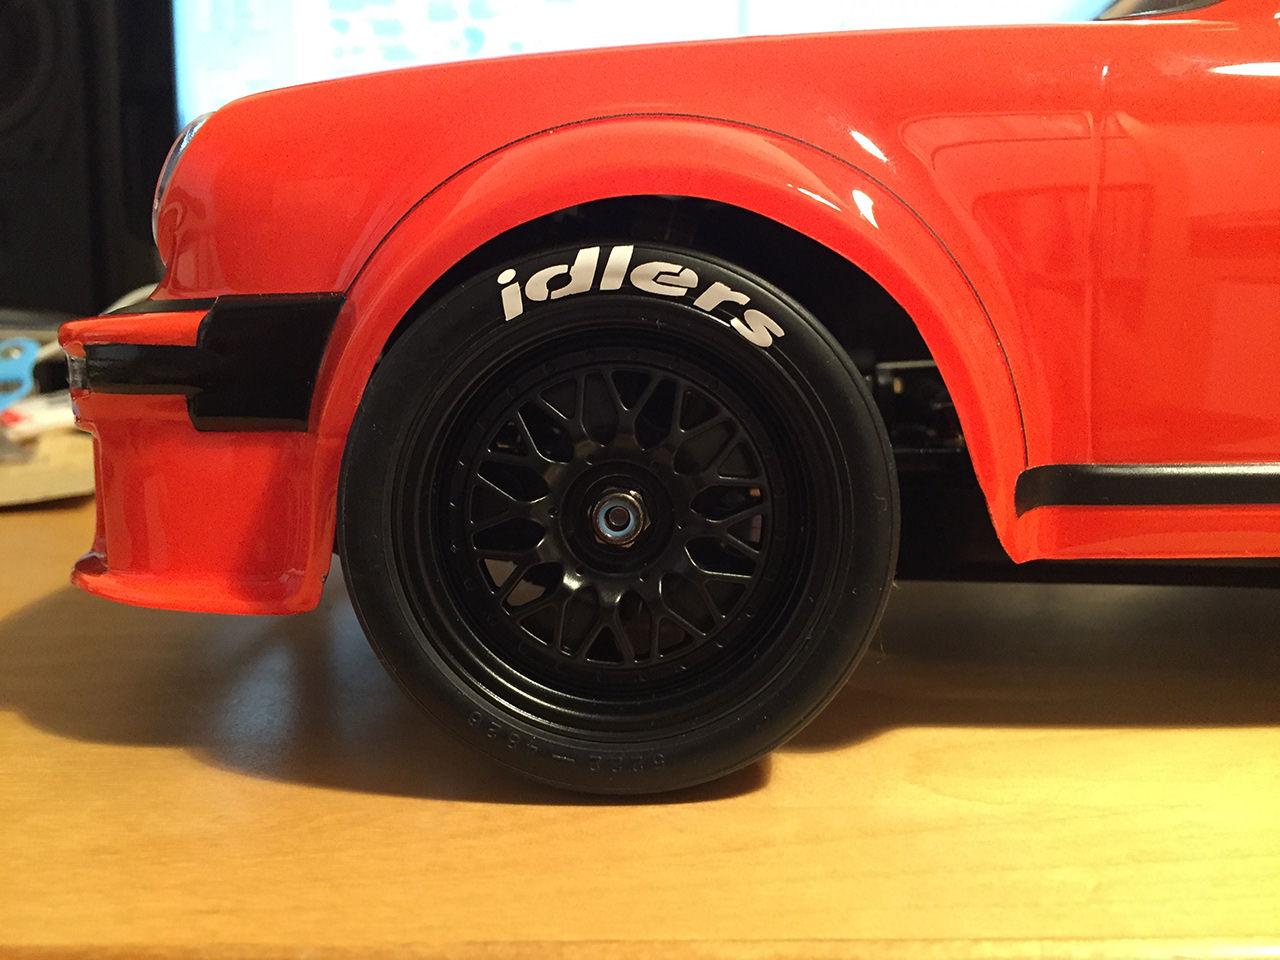 ta02sw-934-body-wheelbase-f.jpg